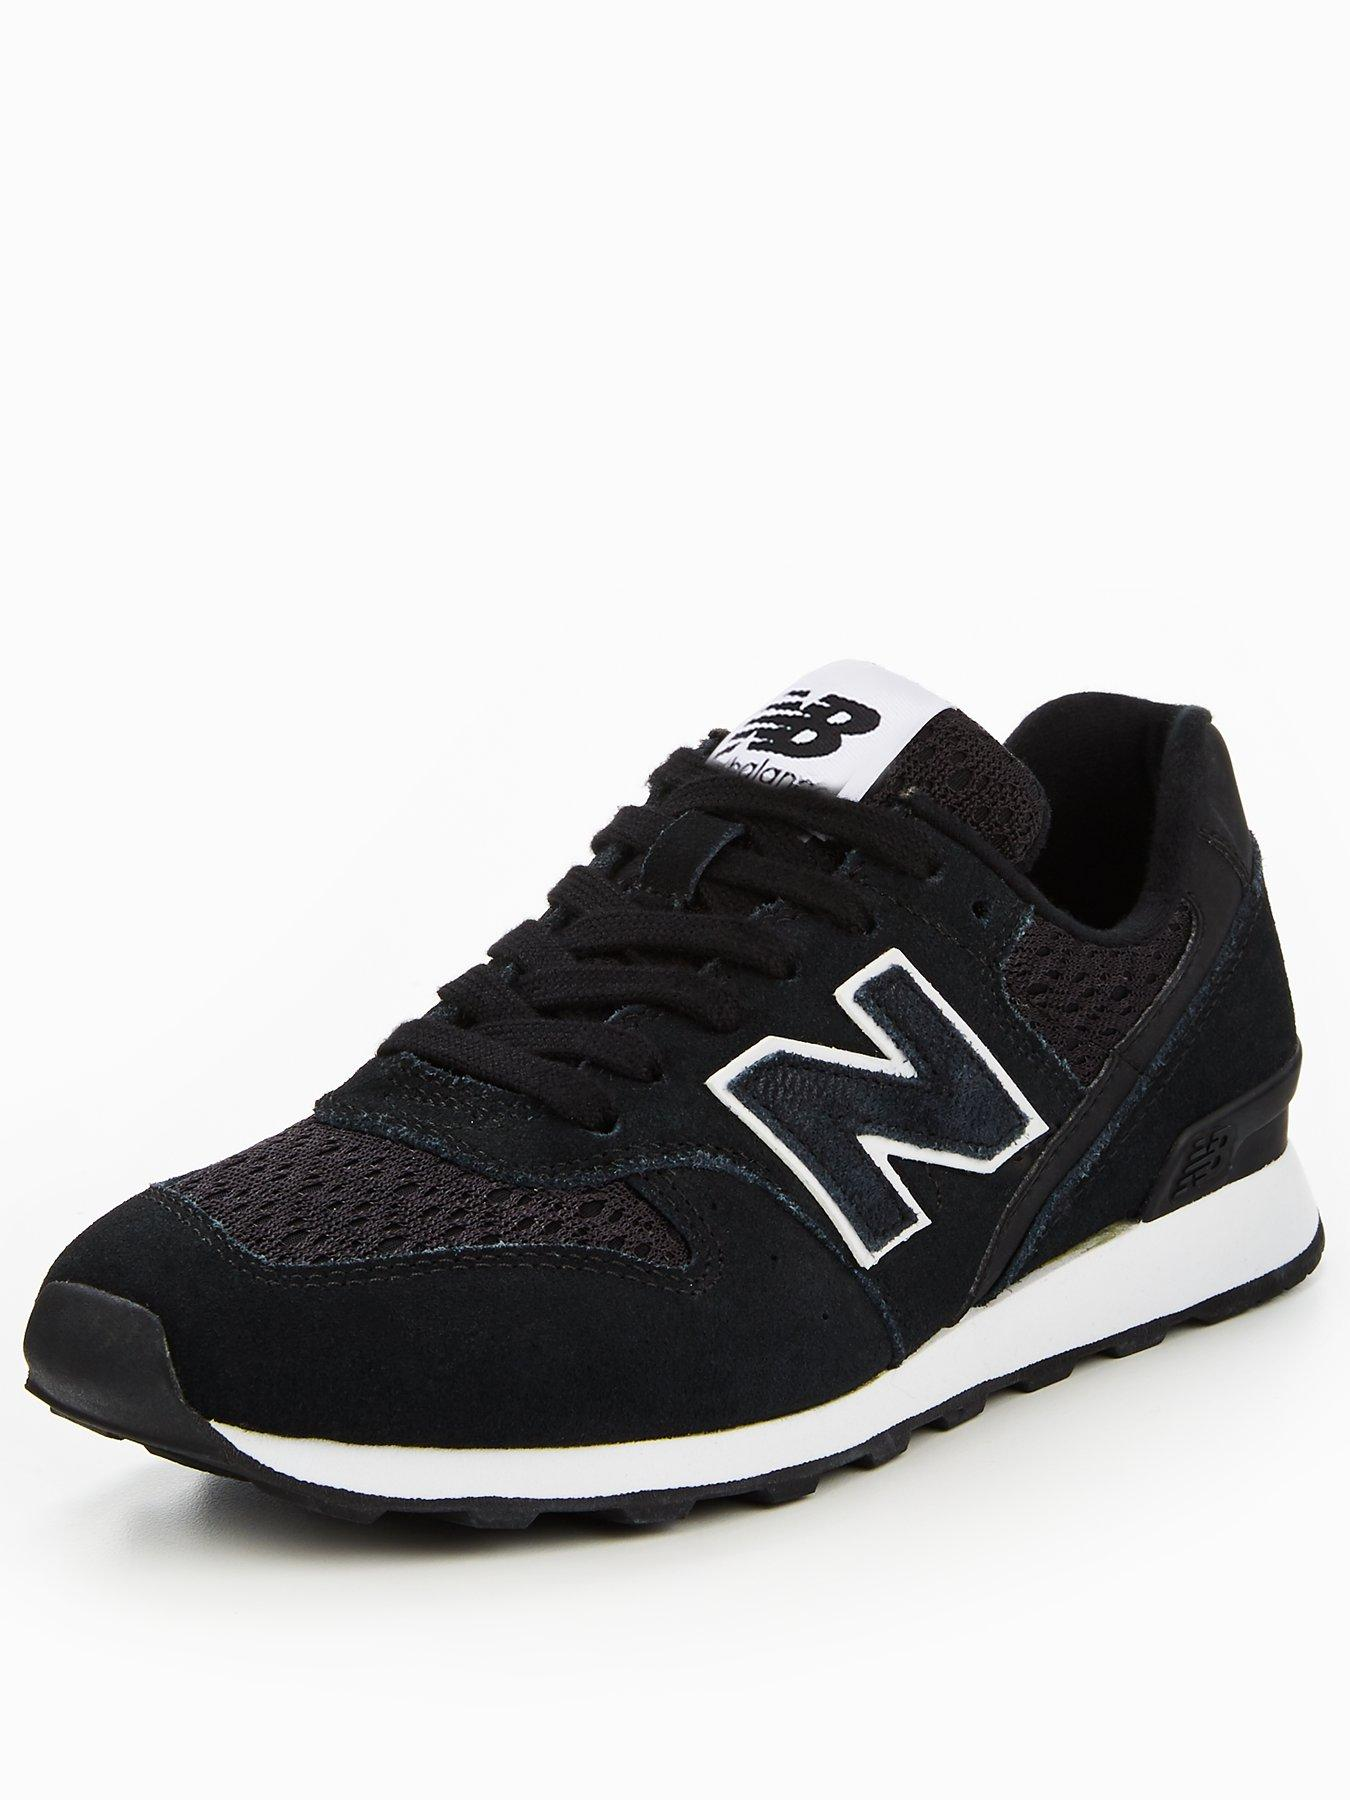 new balance 996 all black